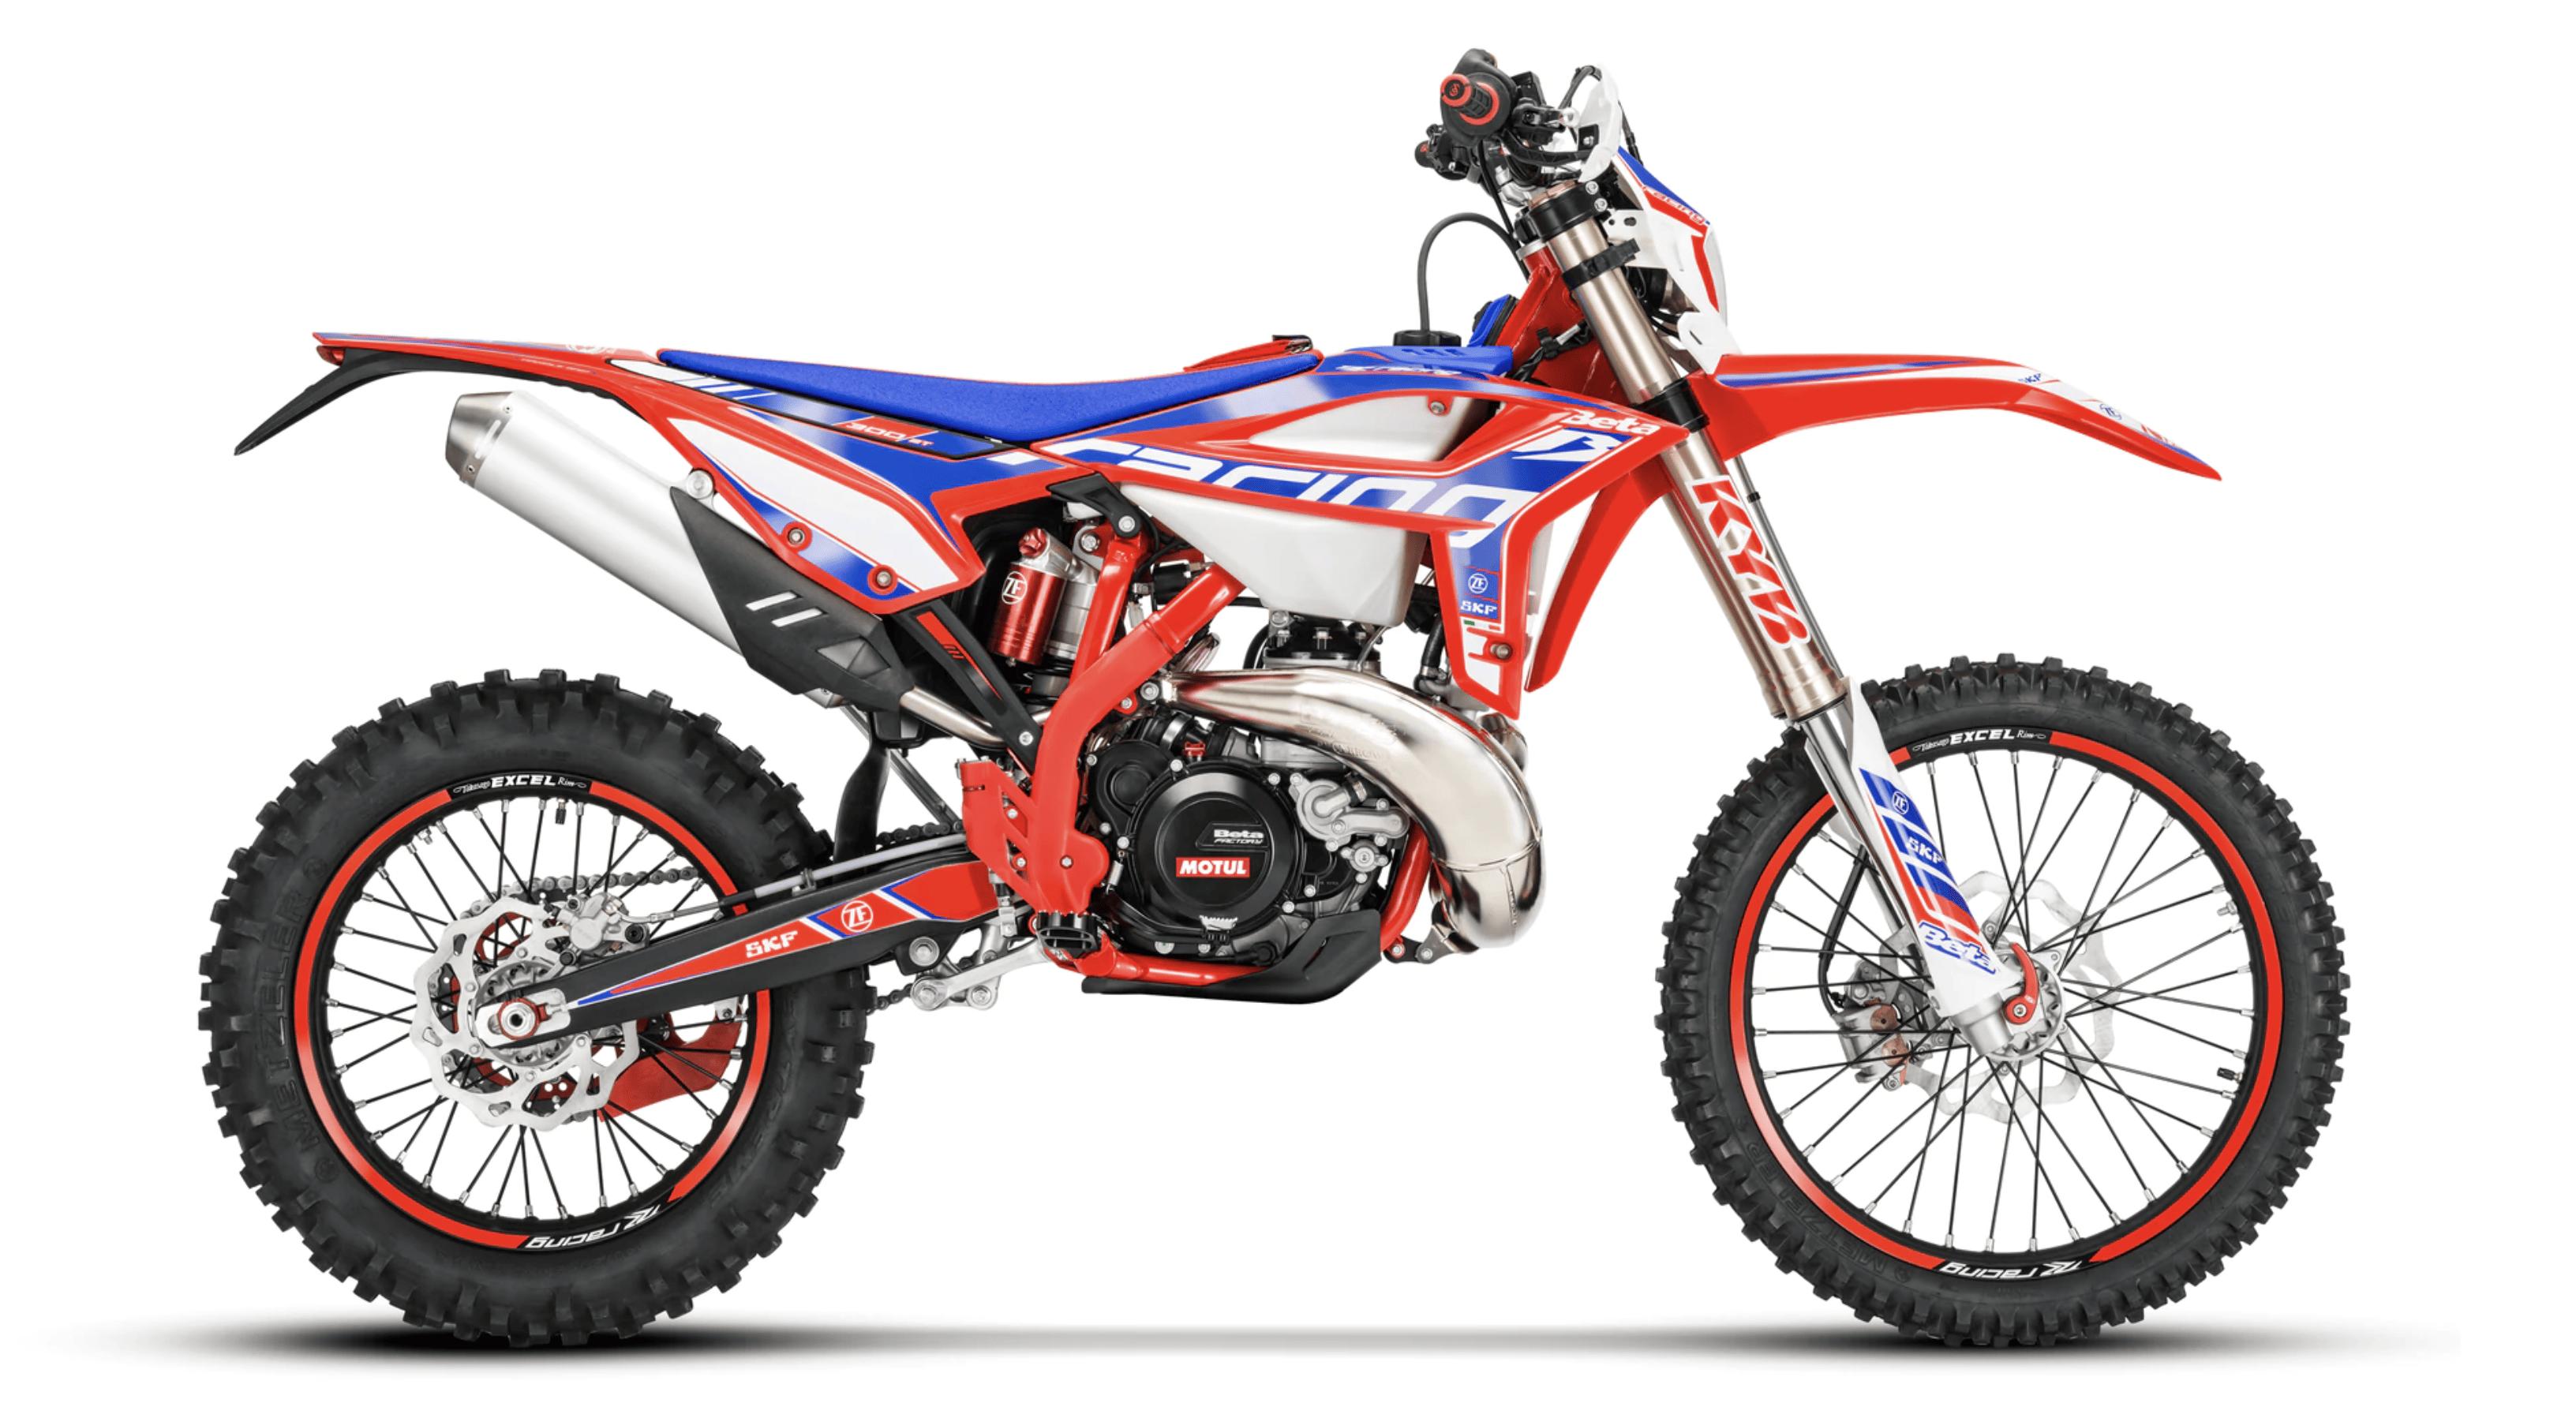 2020 Beta 300 RR Race Edition